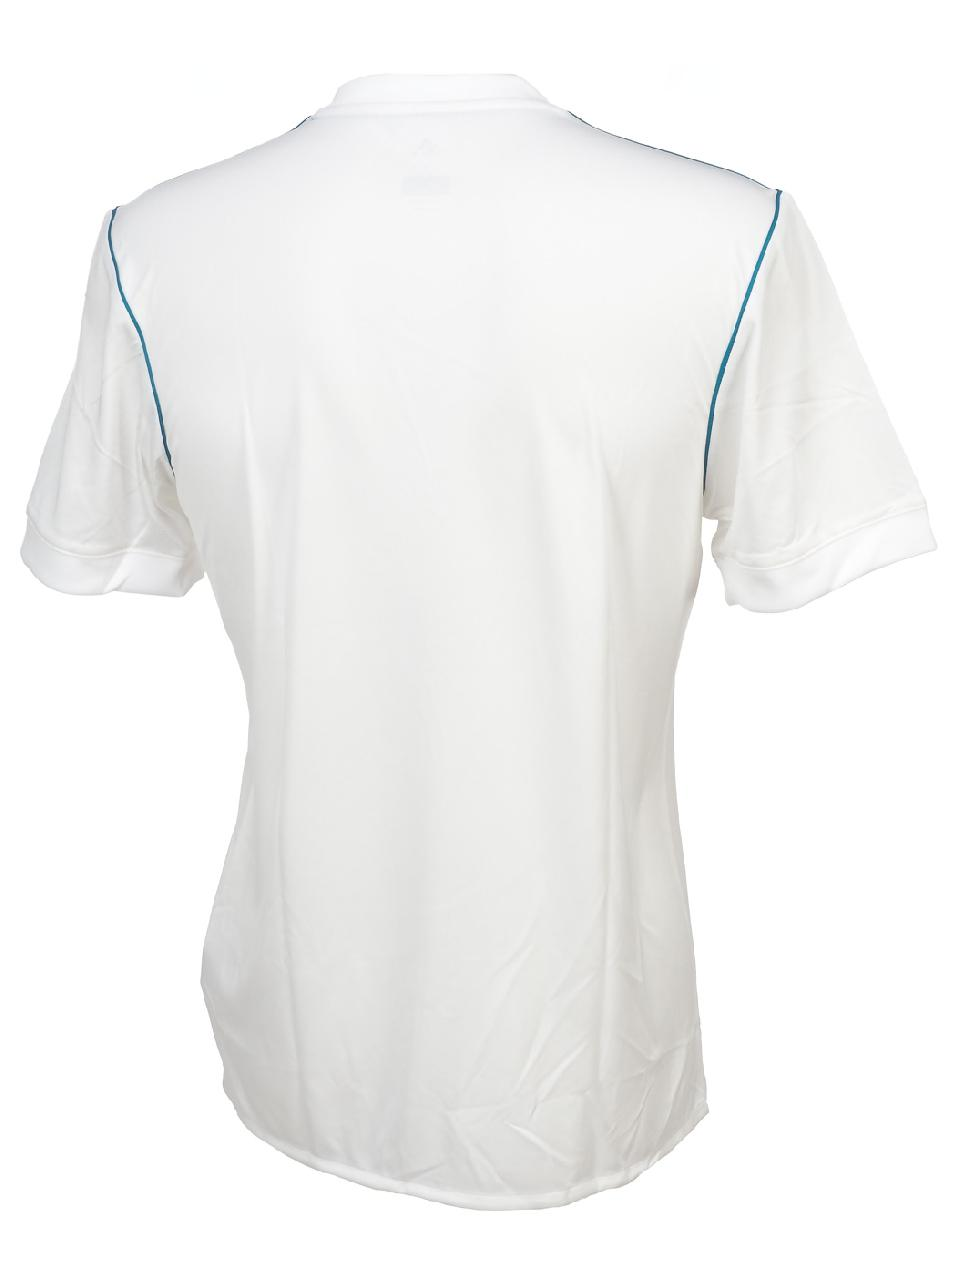 Maillot-de-football-Adidas-Real-maillot-17-18-home-Blanc-74687-Neuf